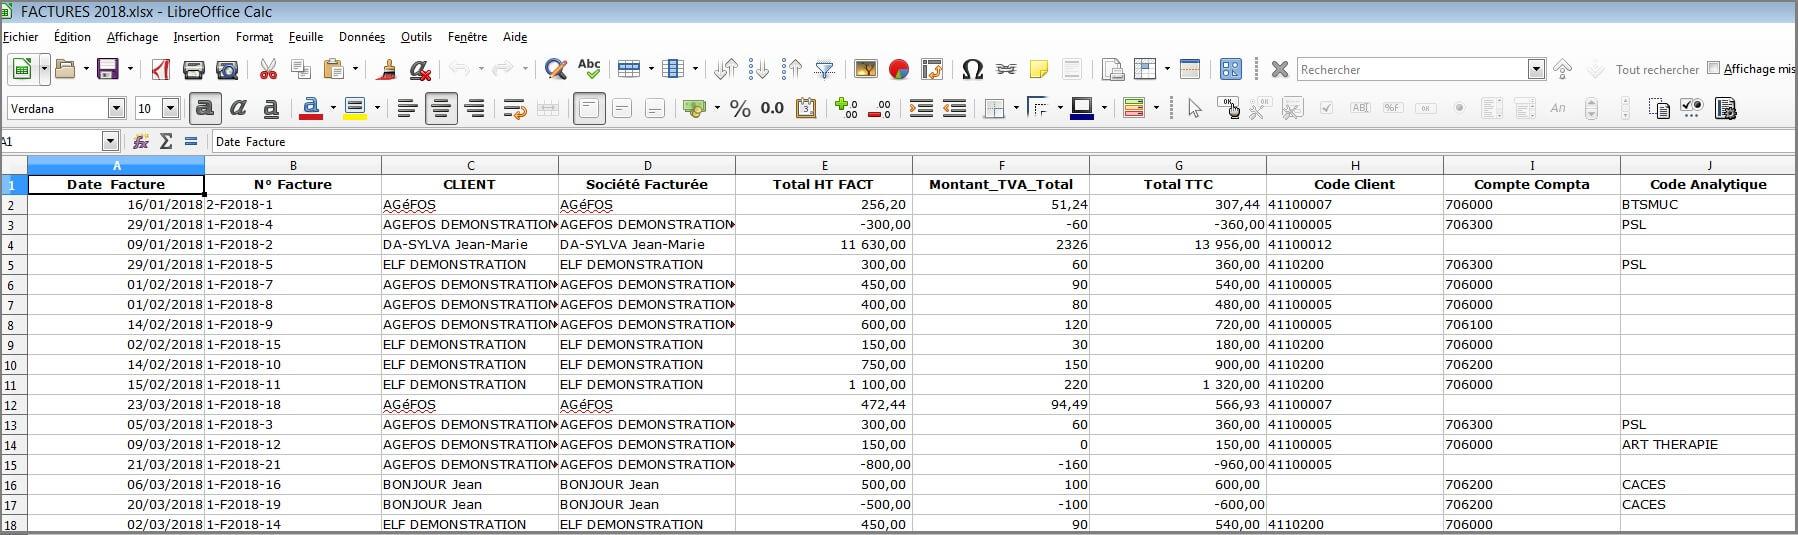 Factures - Fichier Excel